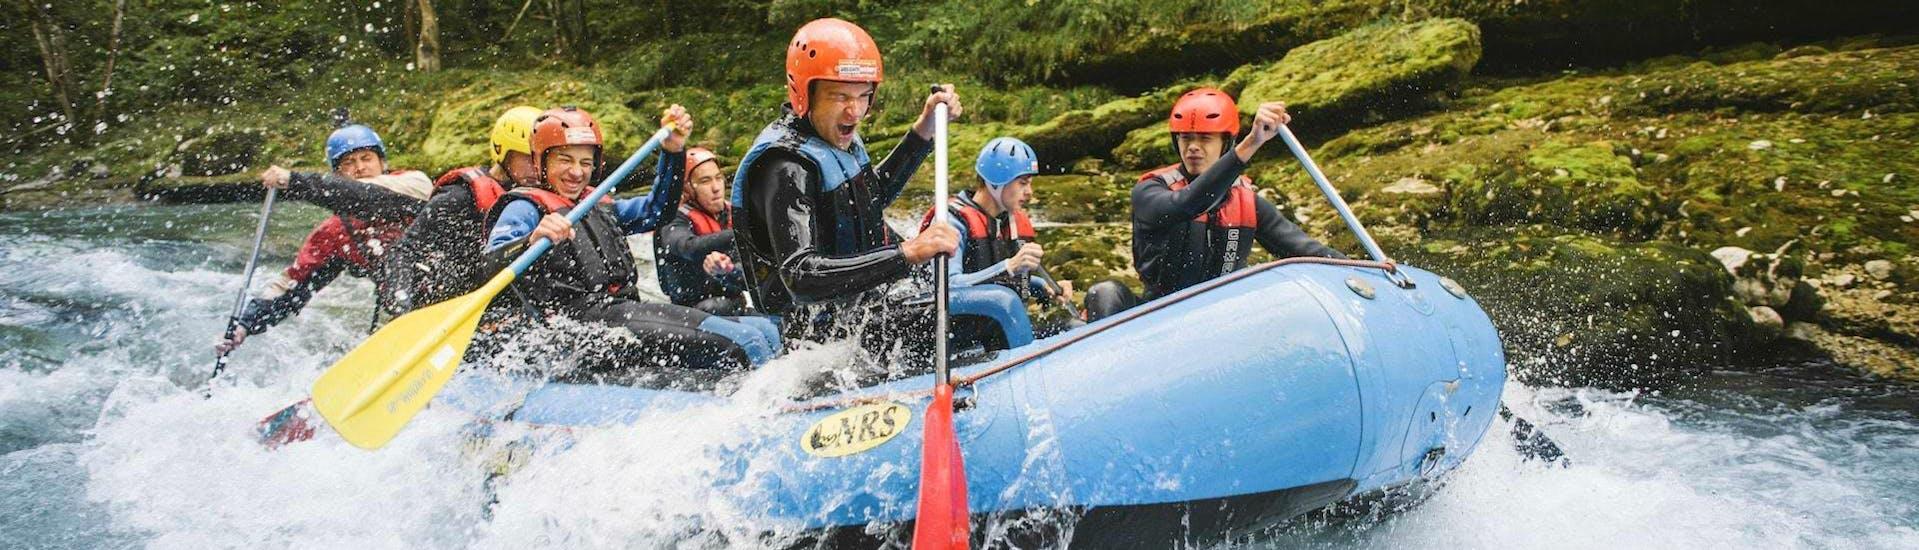 rafting-half-day-enns-adventure-outdoor-strobl-hero